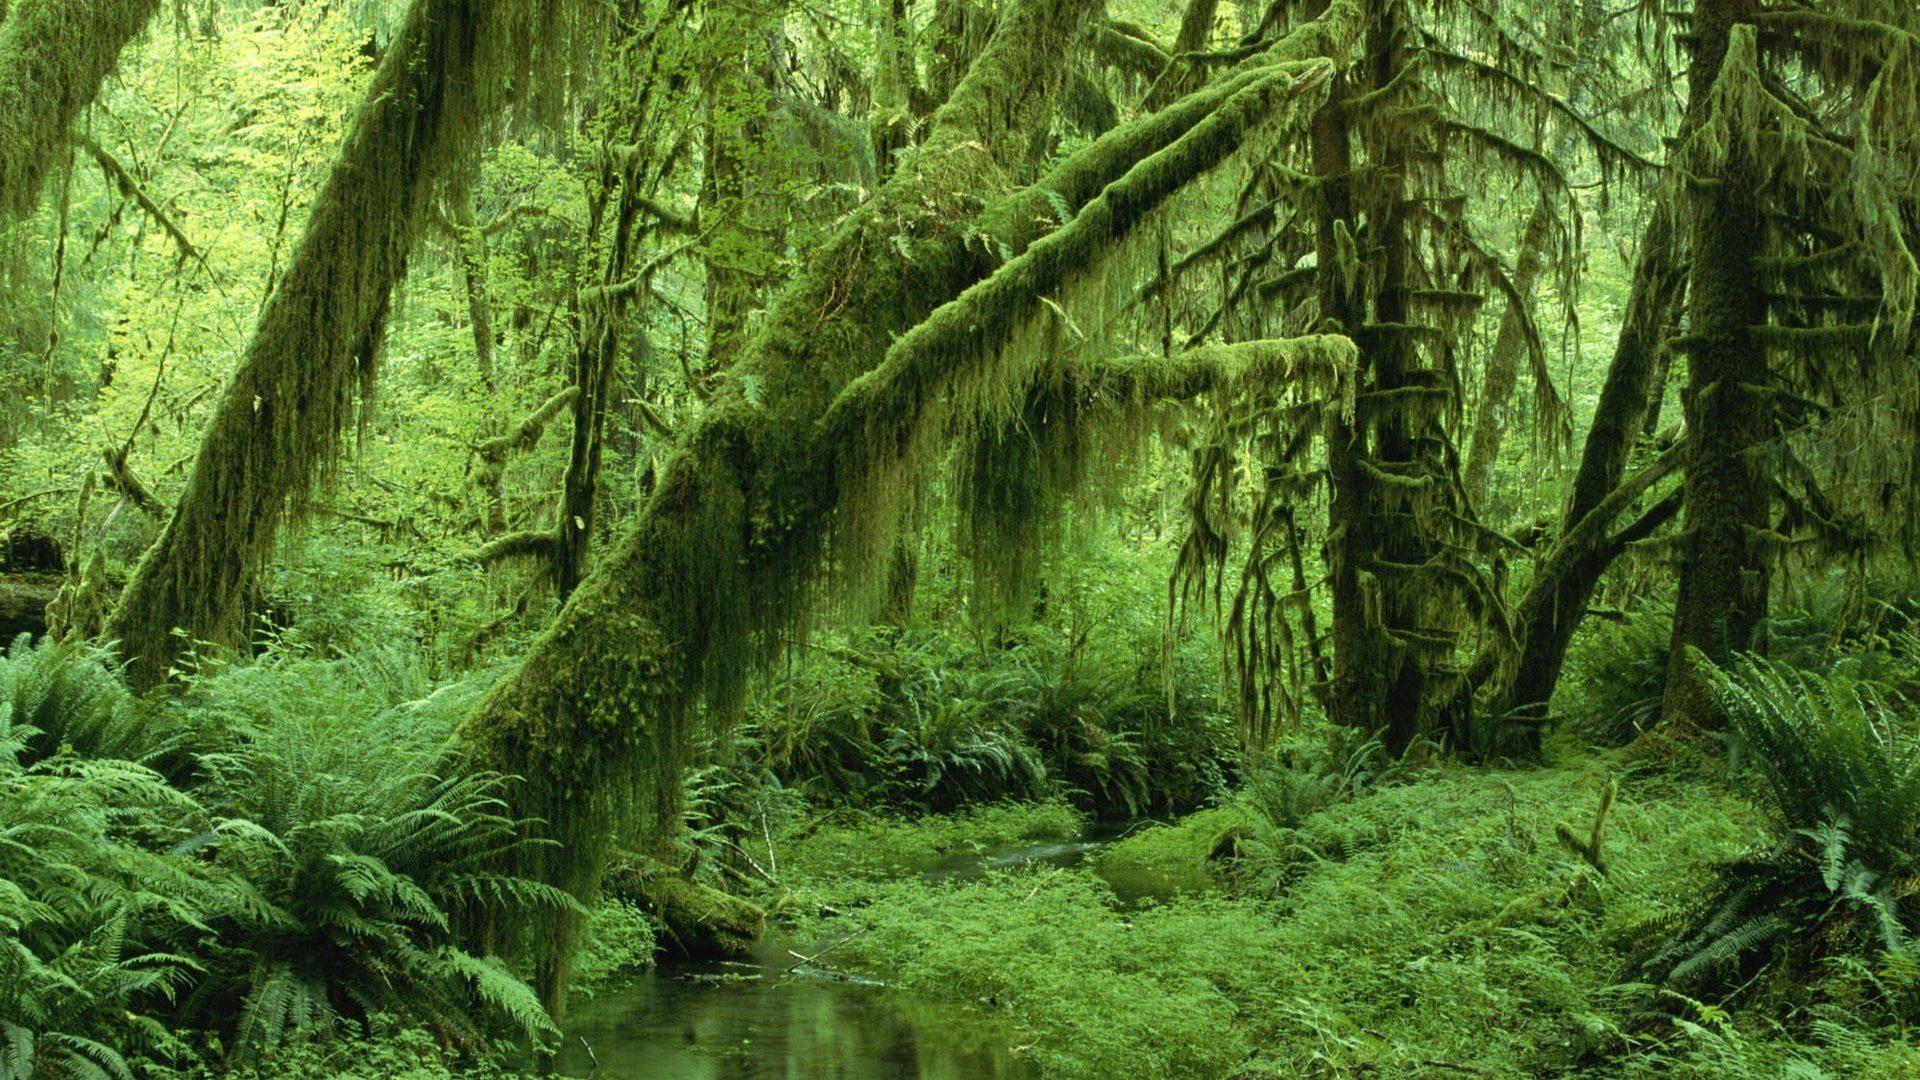 Trees: Season Trees Vines Nature Forest Green Monochrome Leaves ...